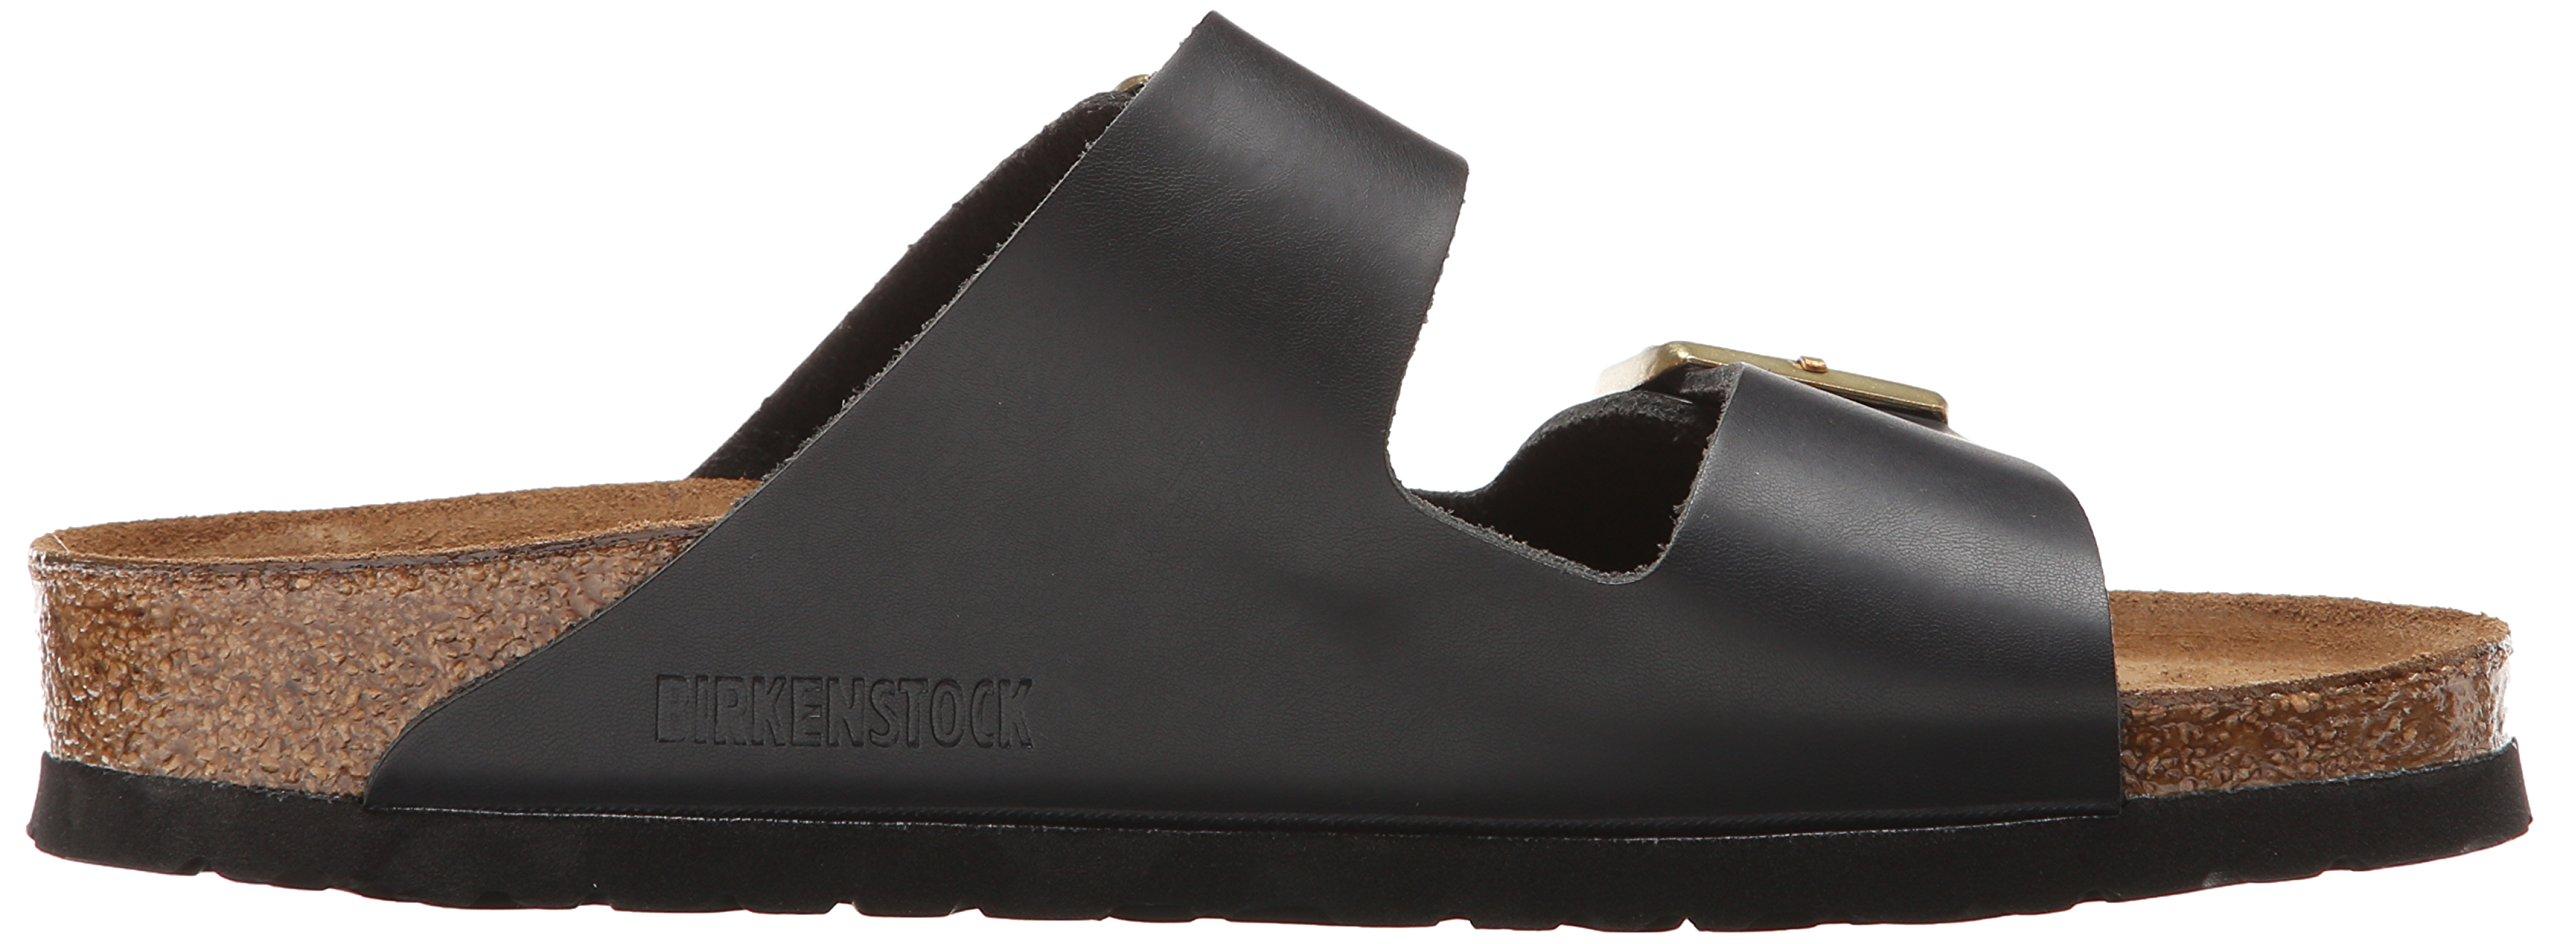 Birkenstock Unisex Arizona Hunter Black Leather Sandals - 9-9.5 2A(N) US Women/7-7.5 2A(N) US Men by Birkenstock (Image #7)